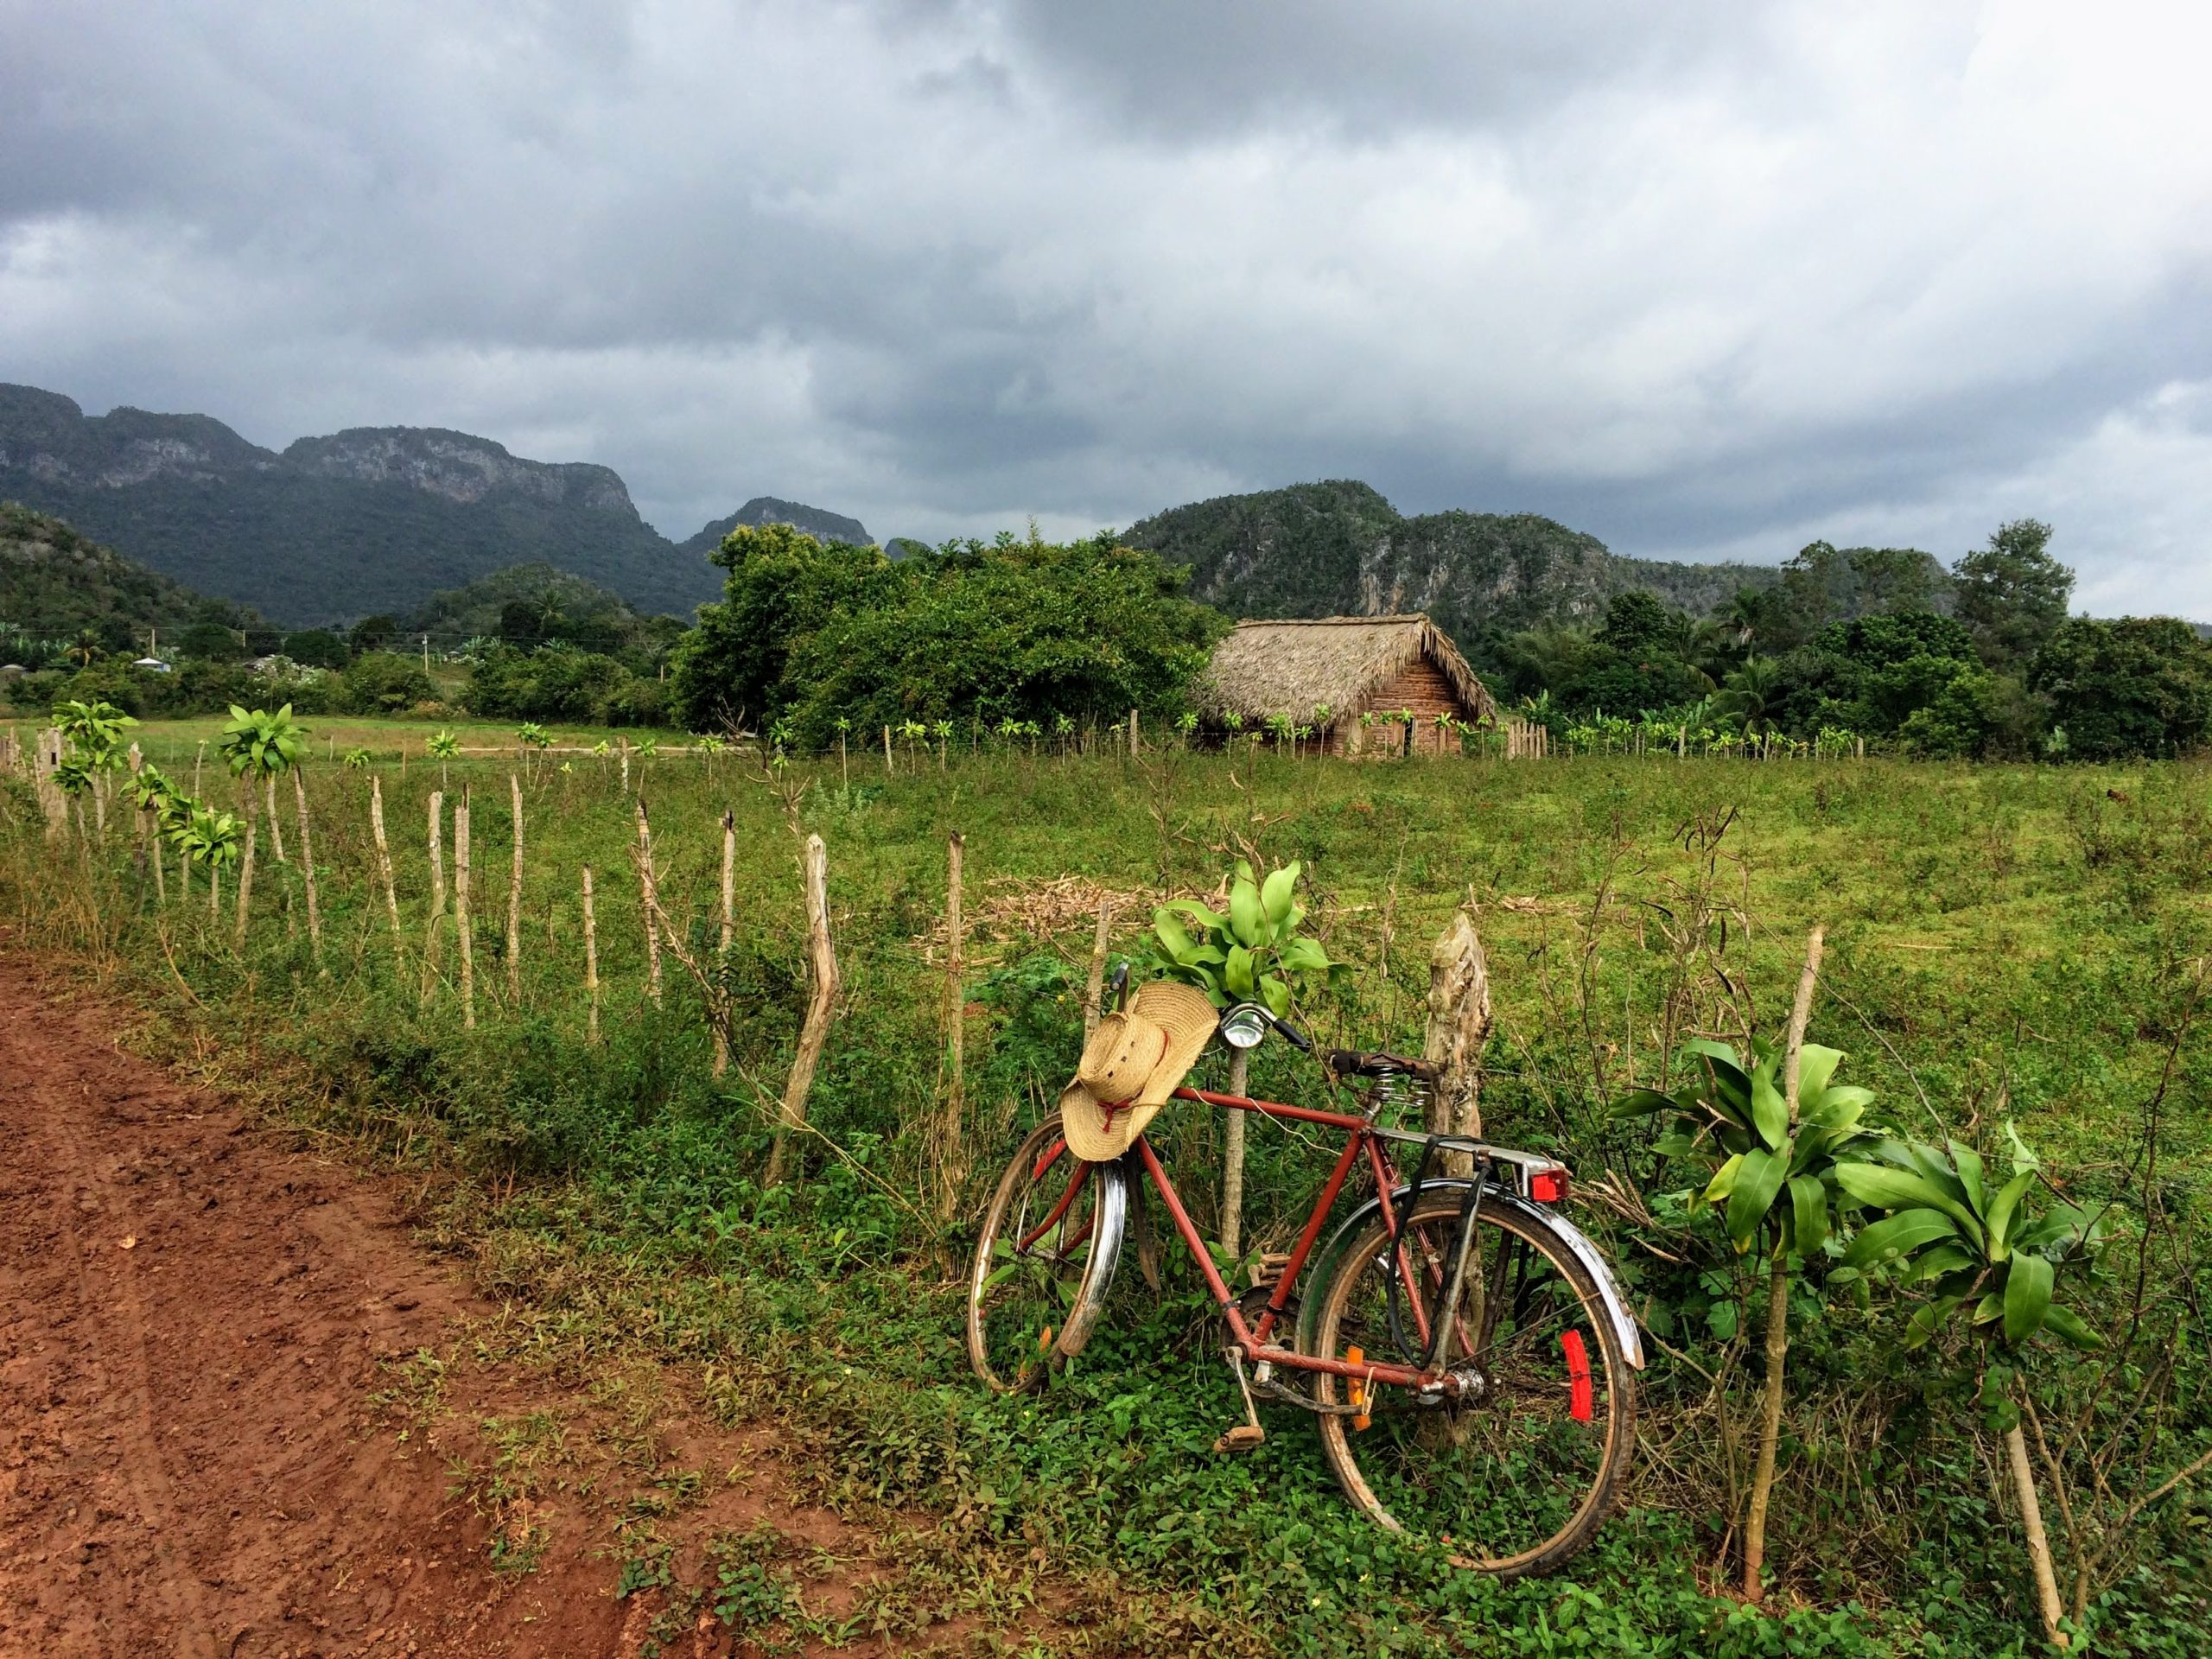 Bike against fence in Pinar del Rio / Vinales